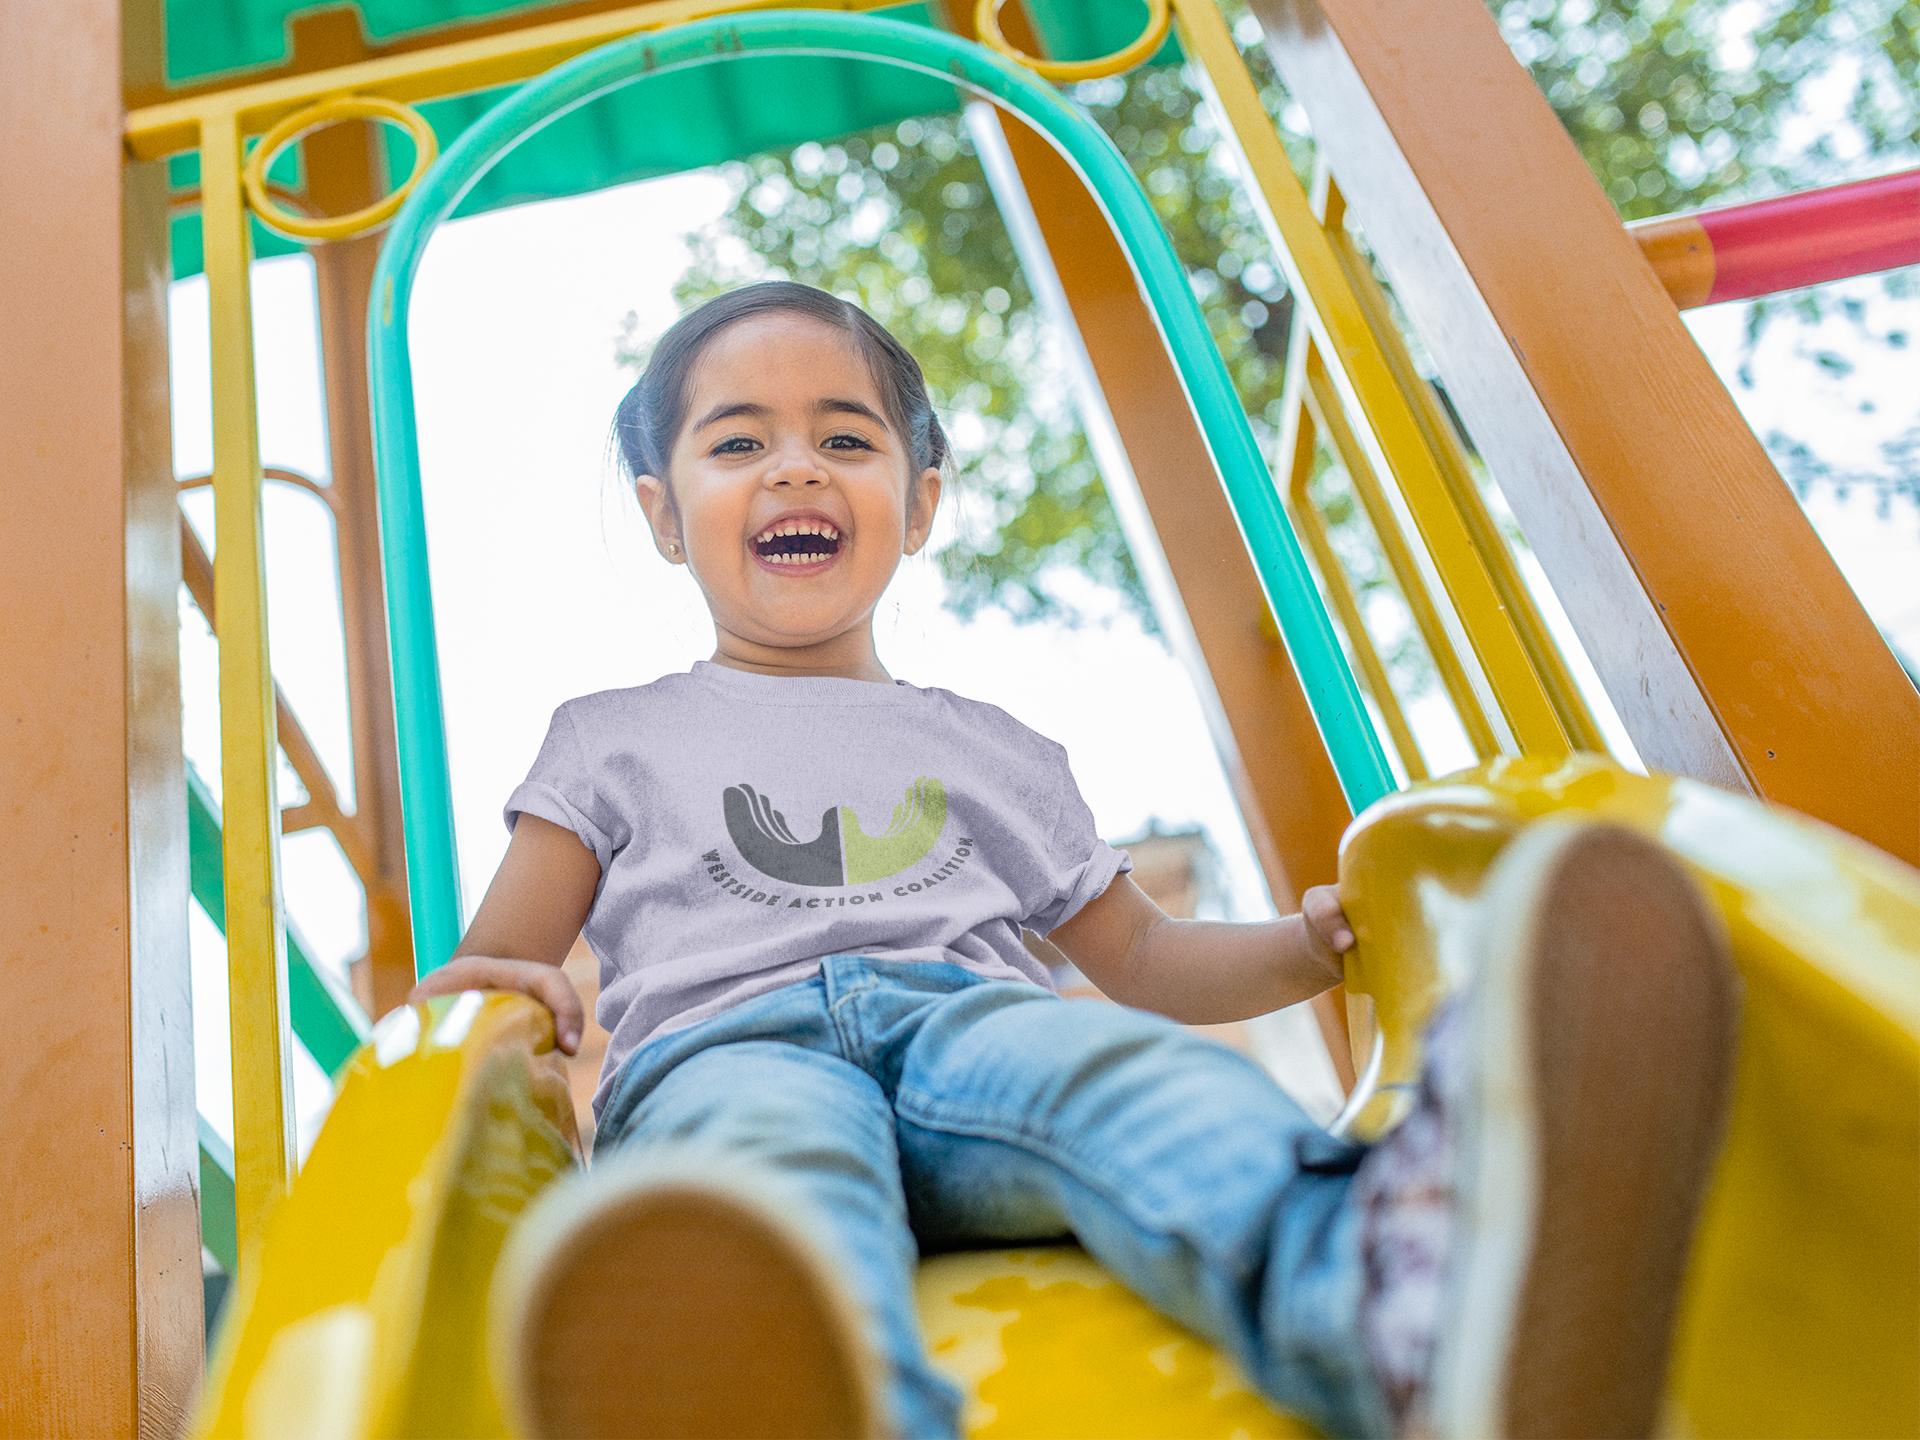 little-girl-riding-down-a-slide-t-shirt-mockup-a12108.png